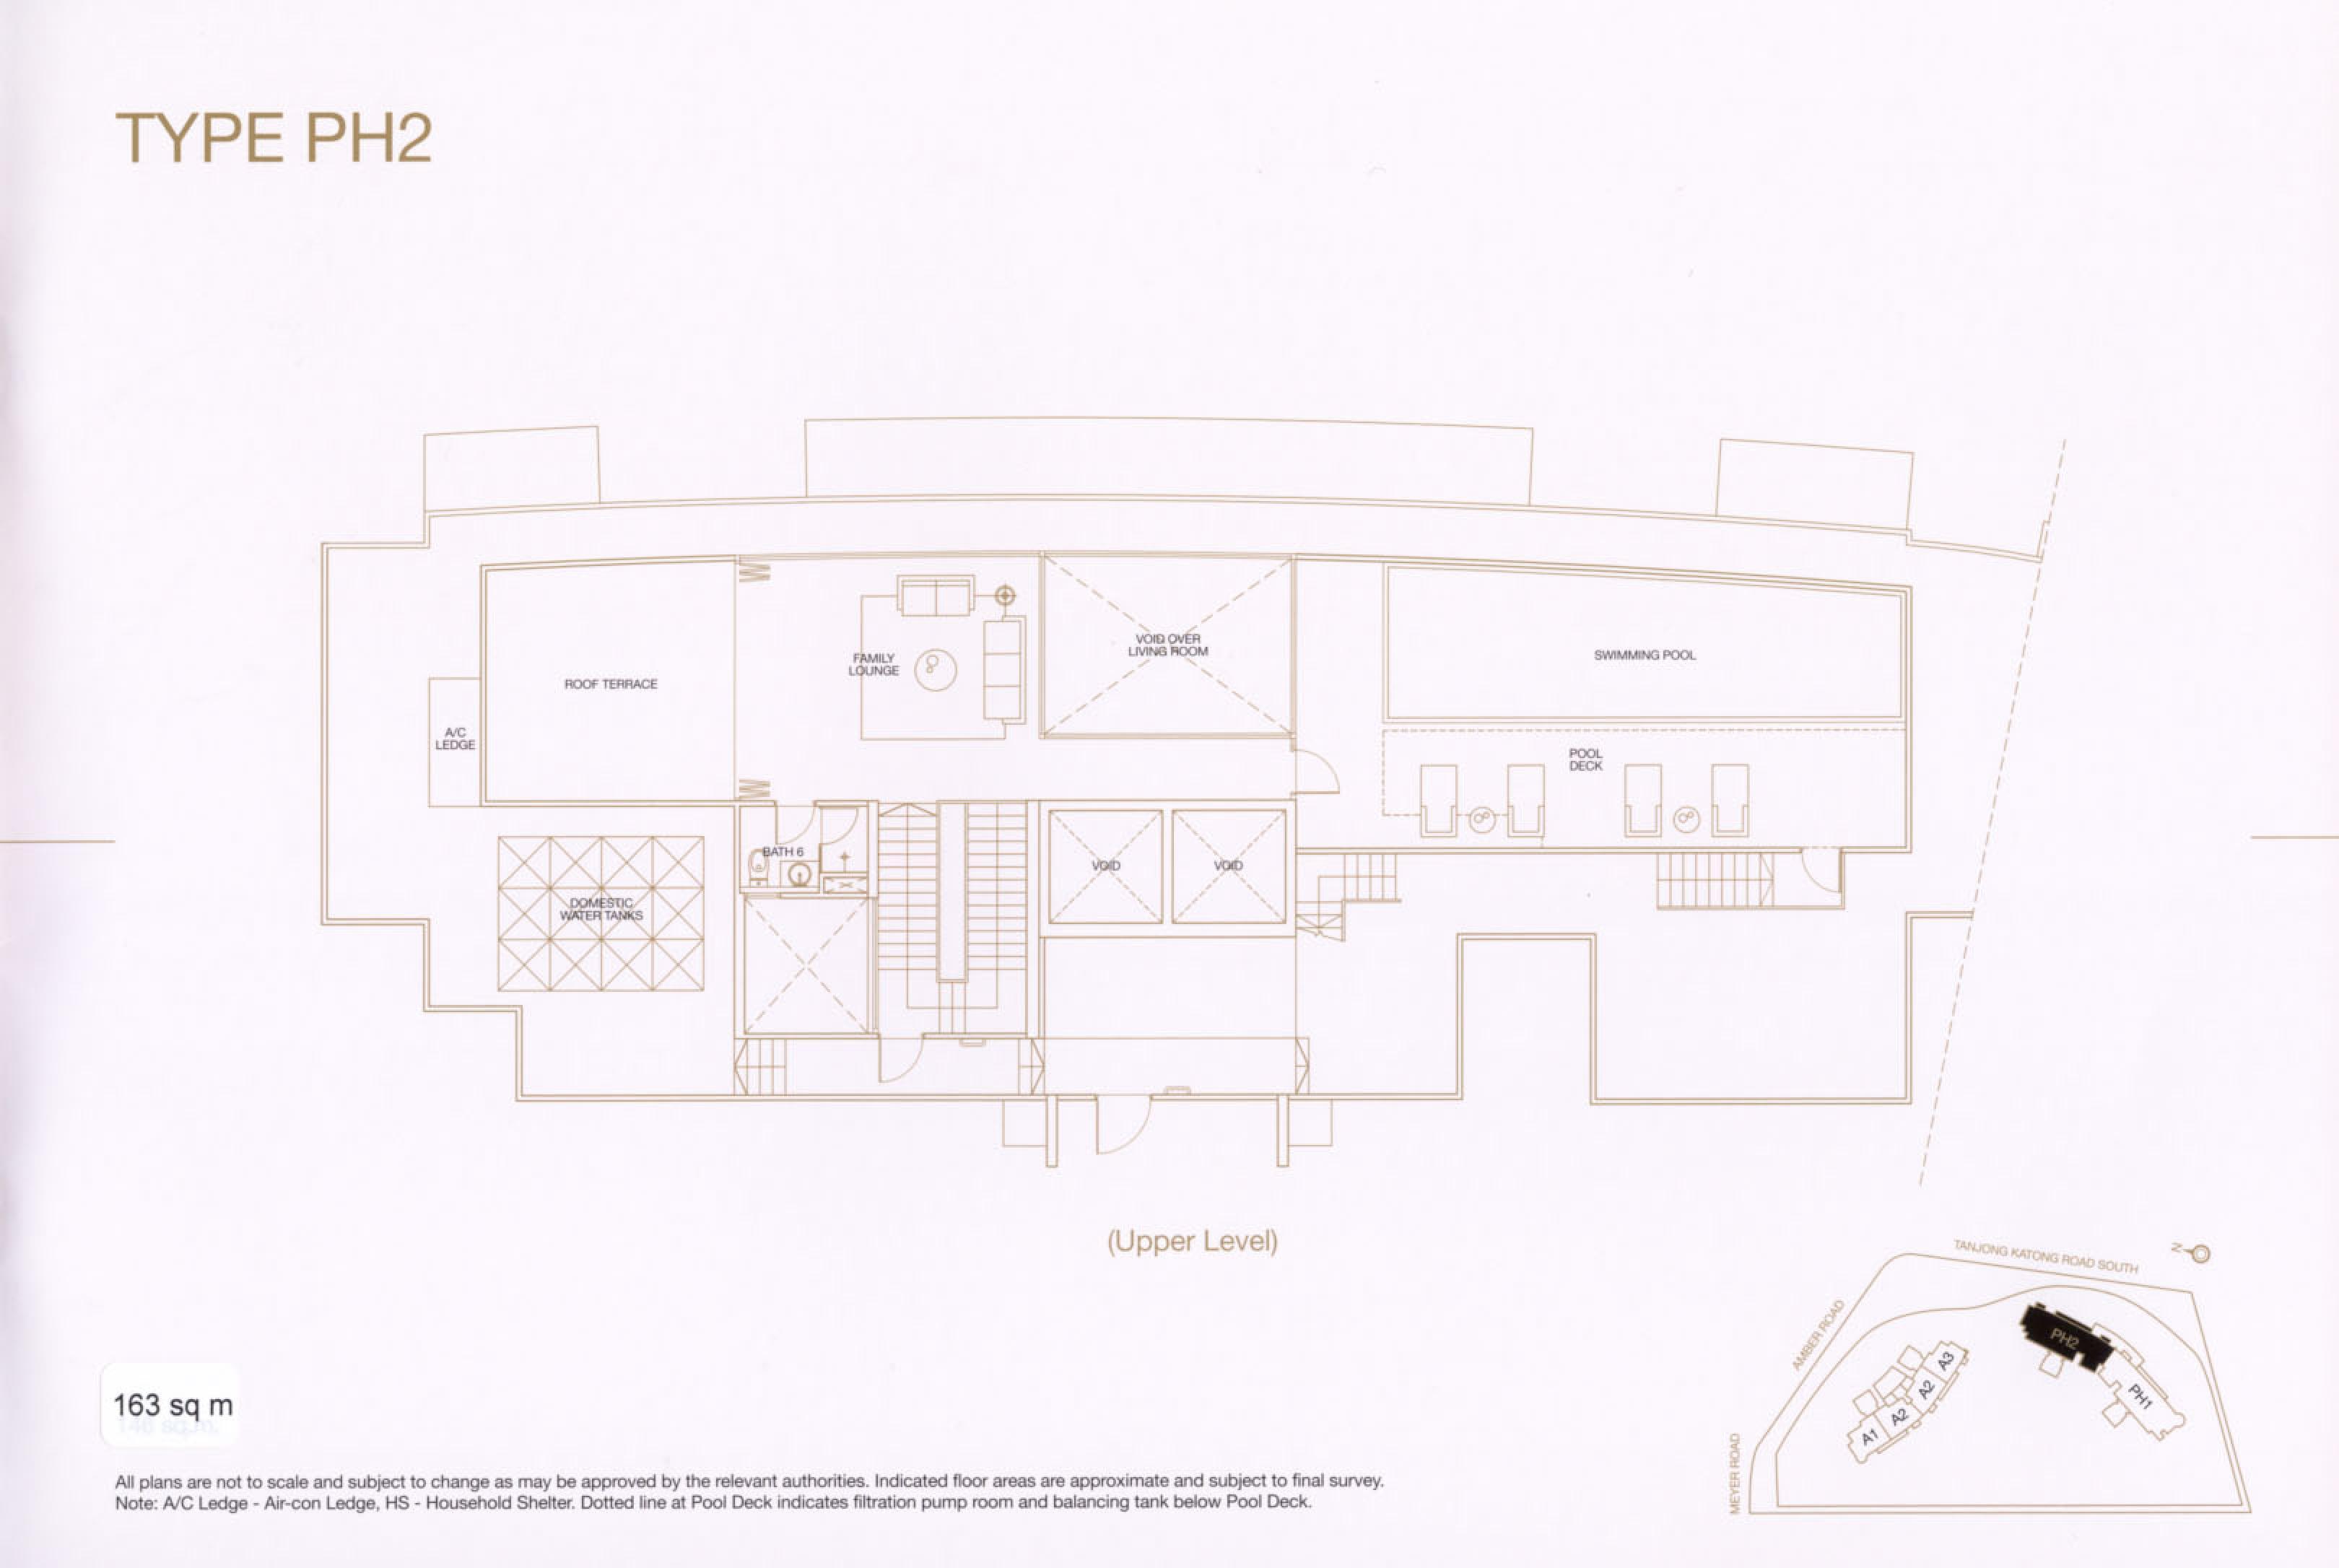 penthouse 5 bed duplex aalto. Black Bedroom Furniture Sets. Home Design Ideas